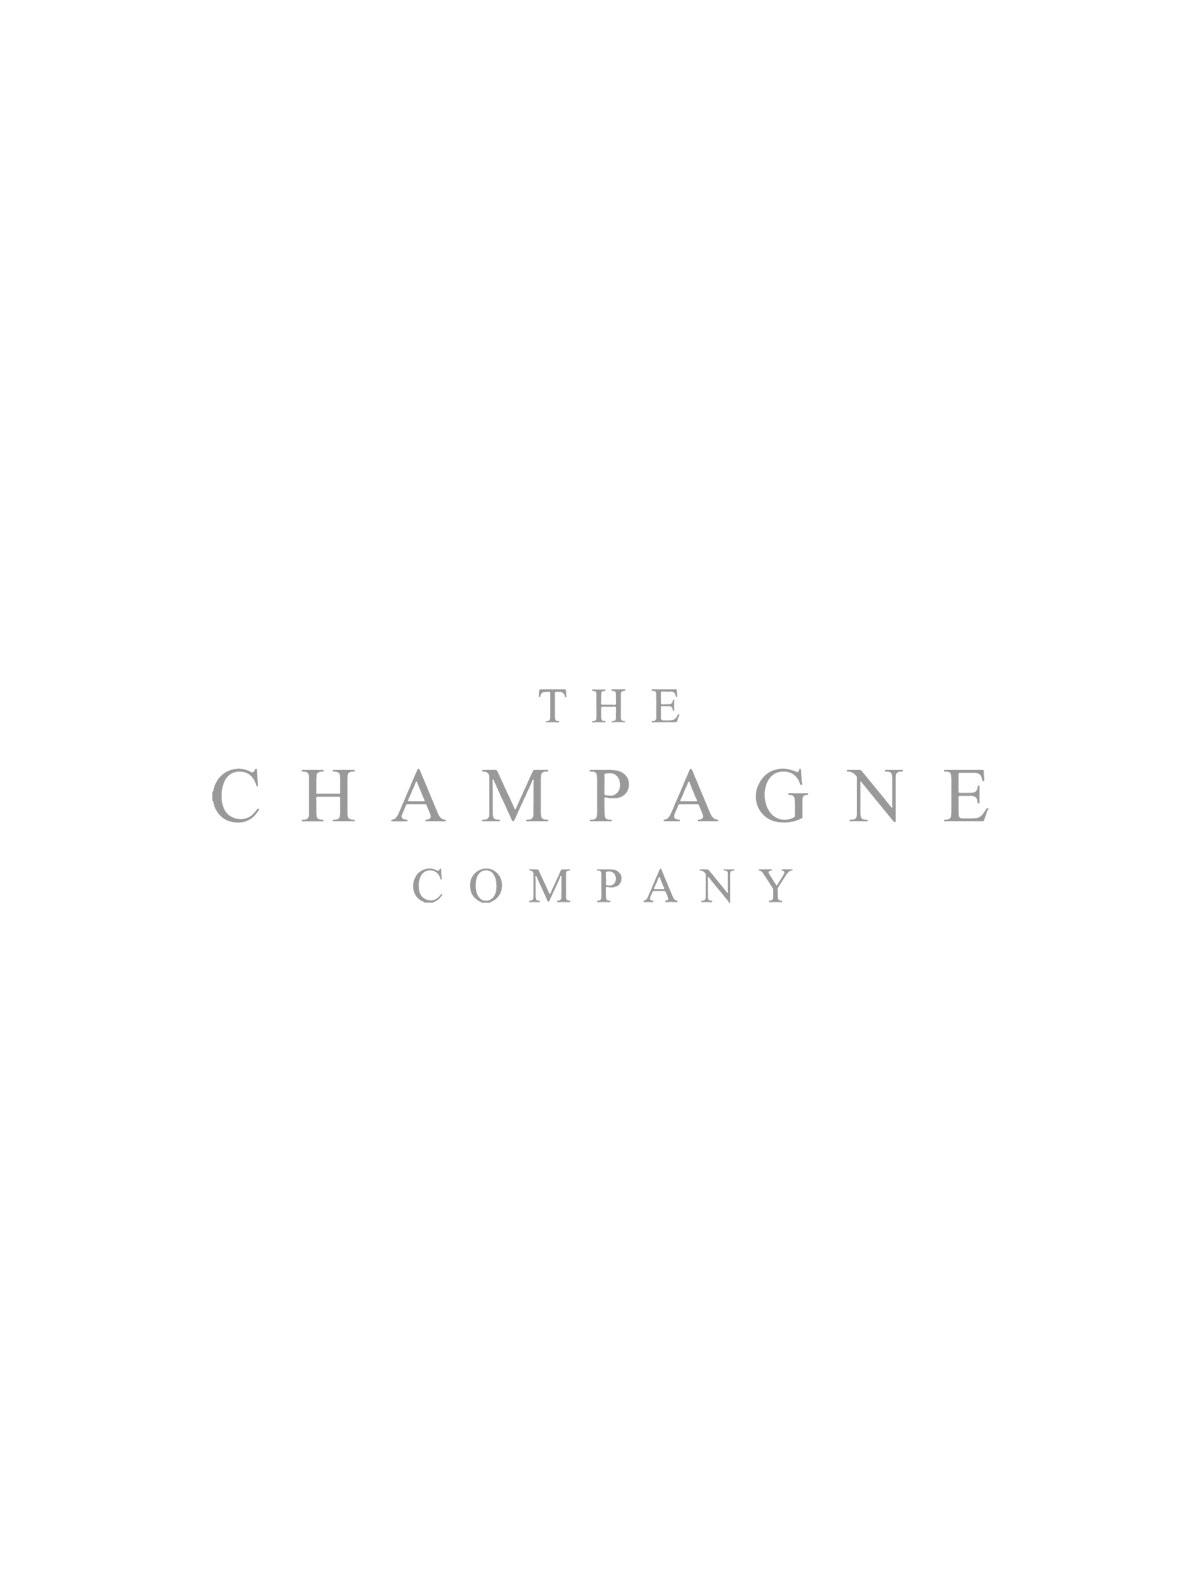 Dom Perignon 2009 Vintage Champagne 75cl